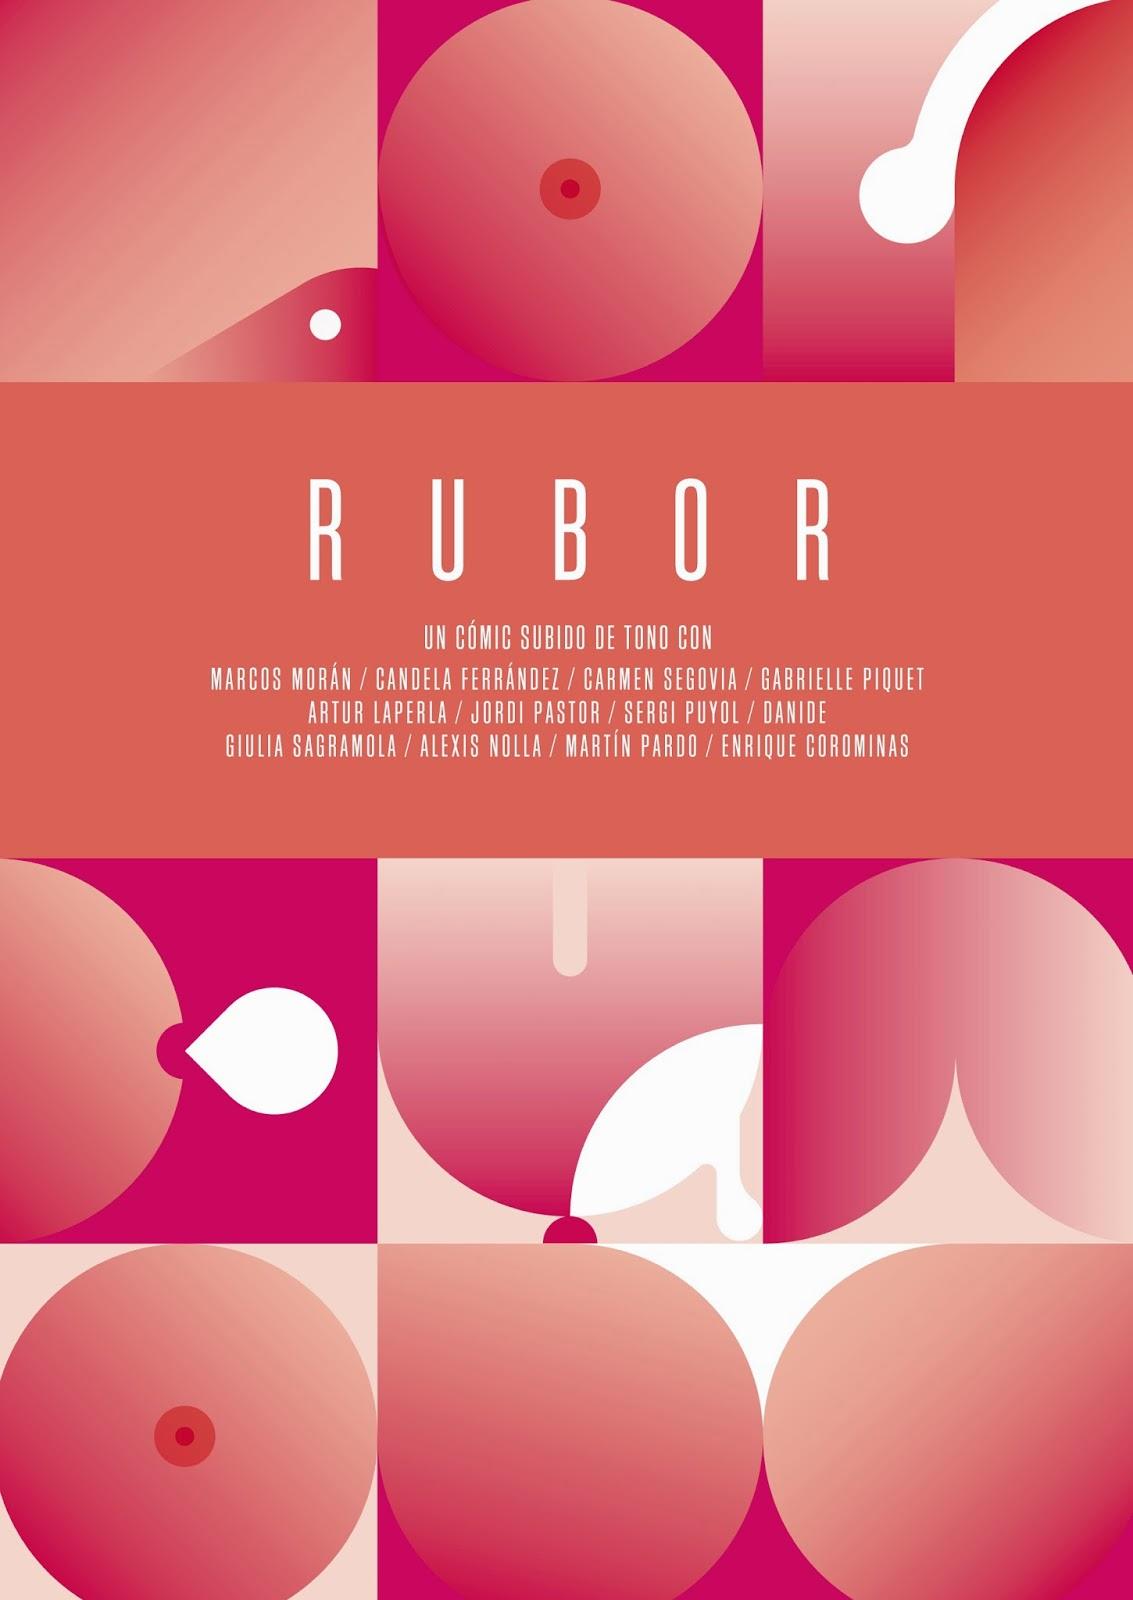 Rubor - Jordi Pastor